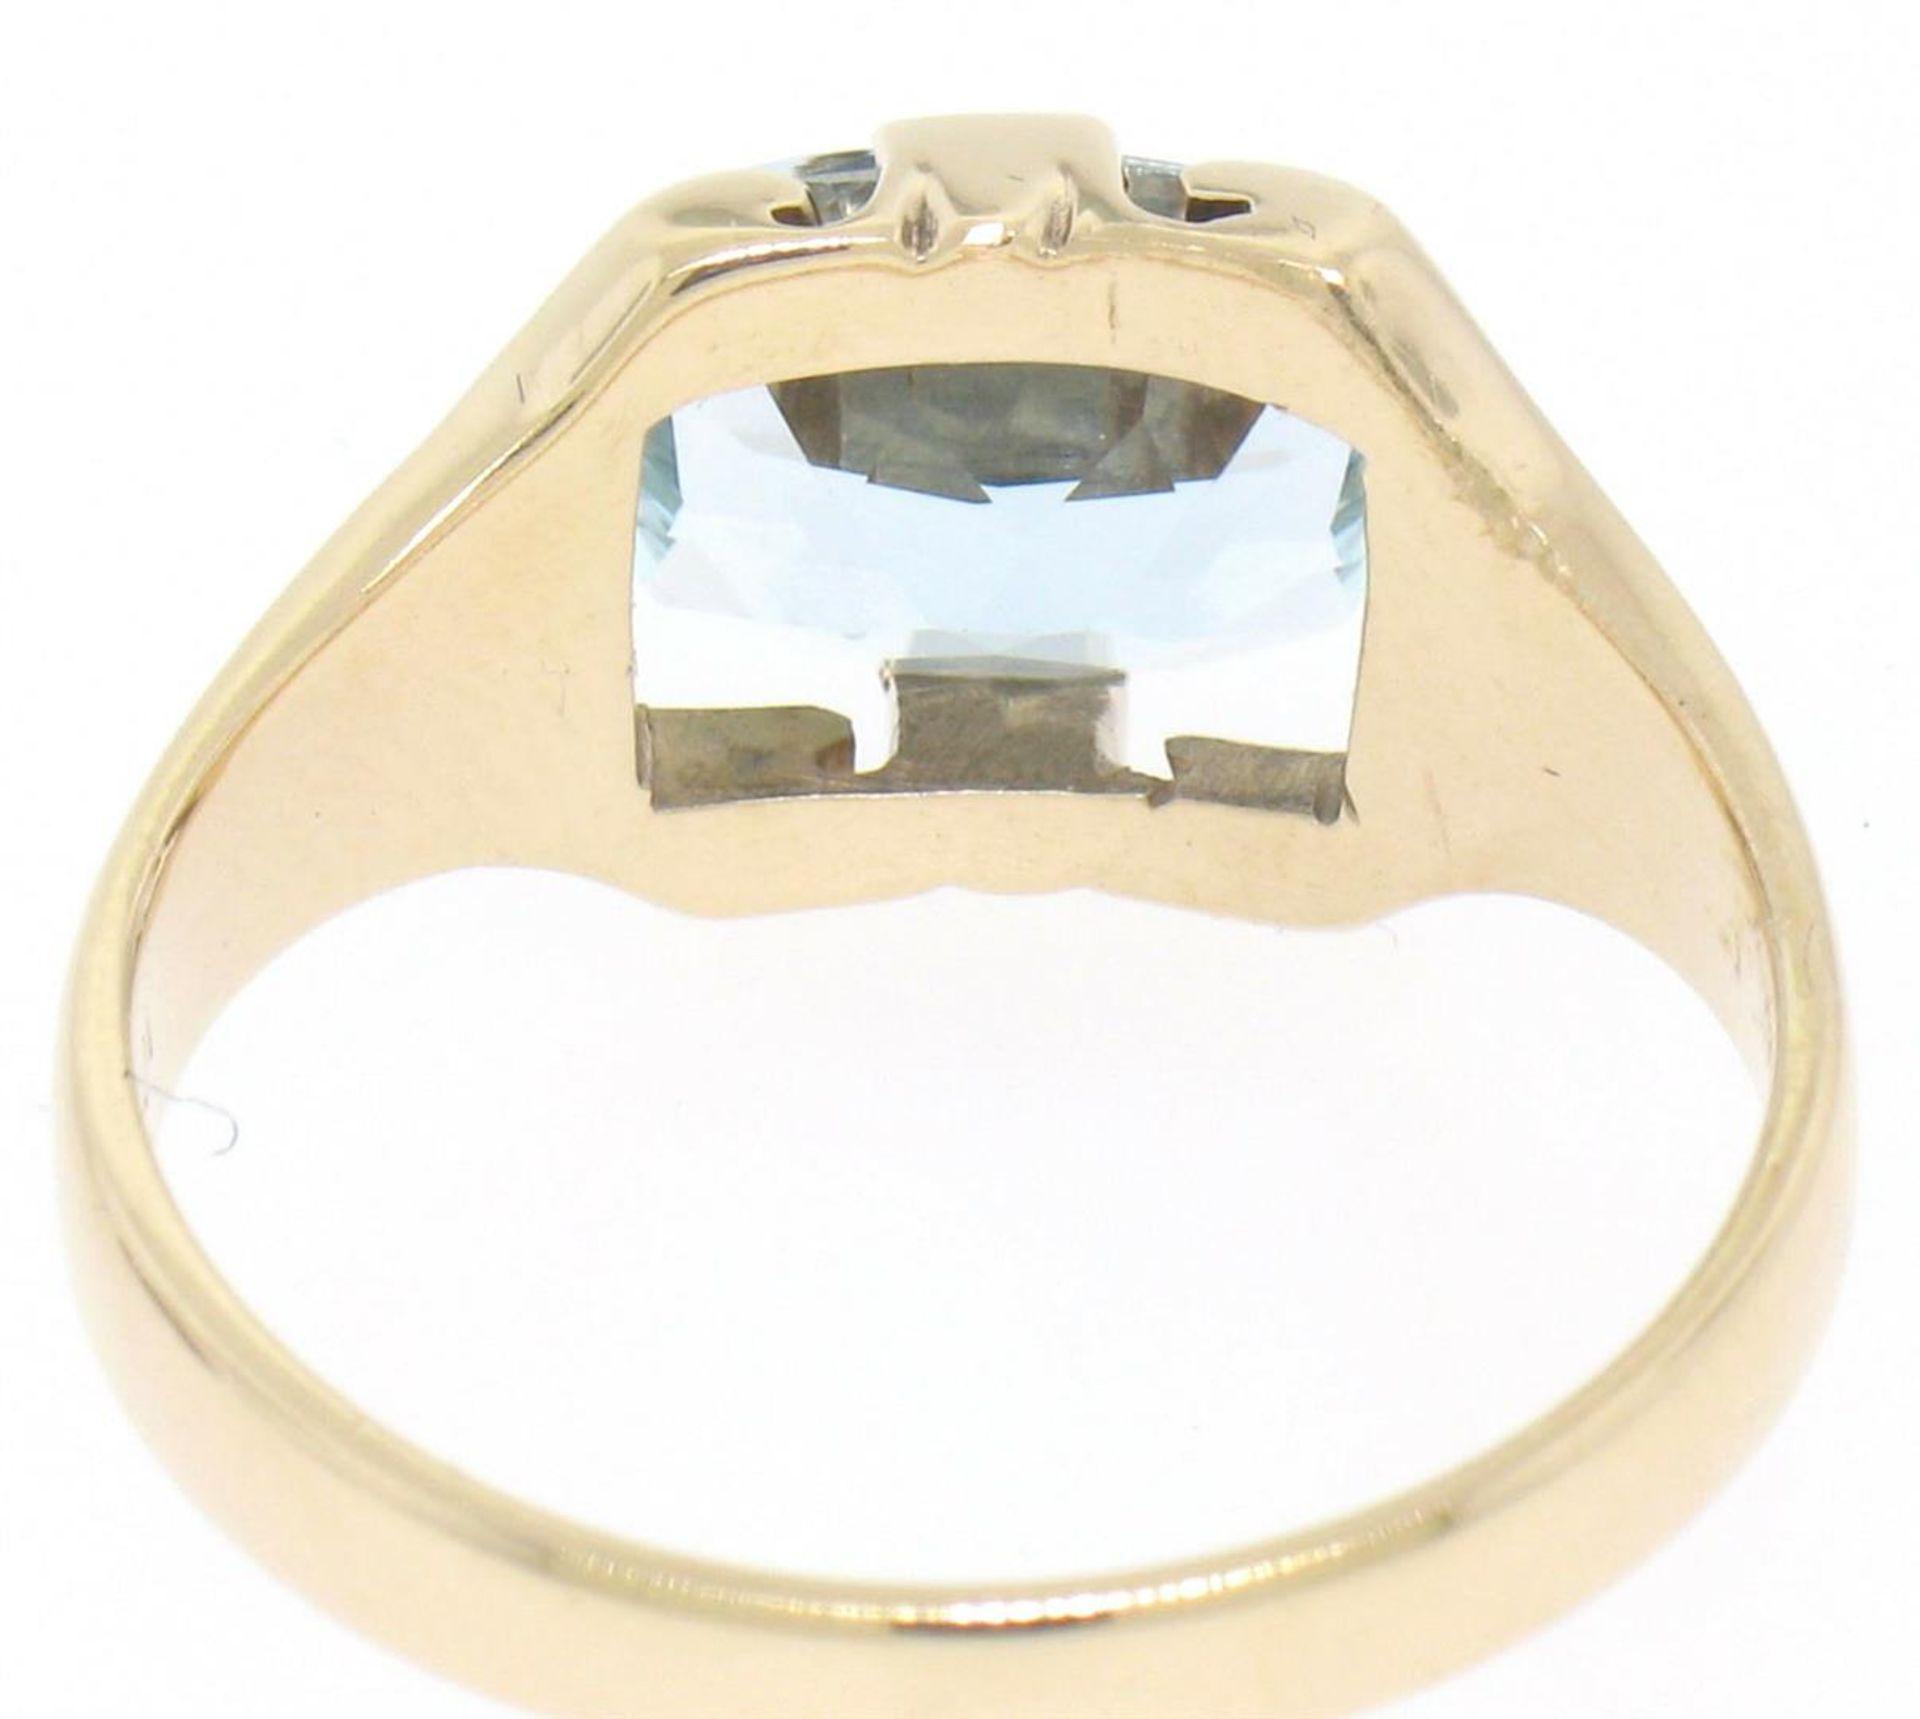 10k Gold Cushion Cut Horizontal Aquamarine Solitaire Ladies Ring - Image 4 of 4